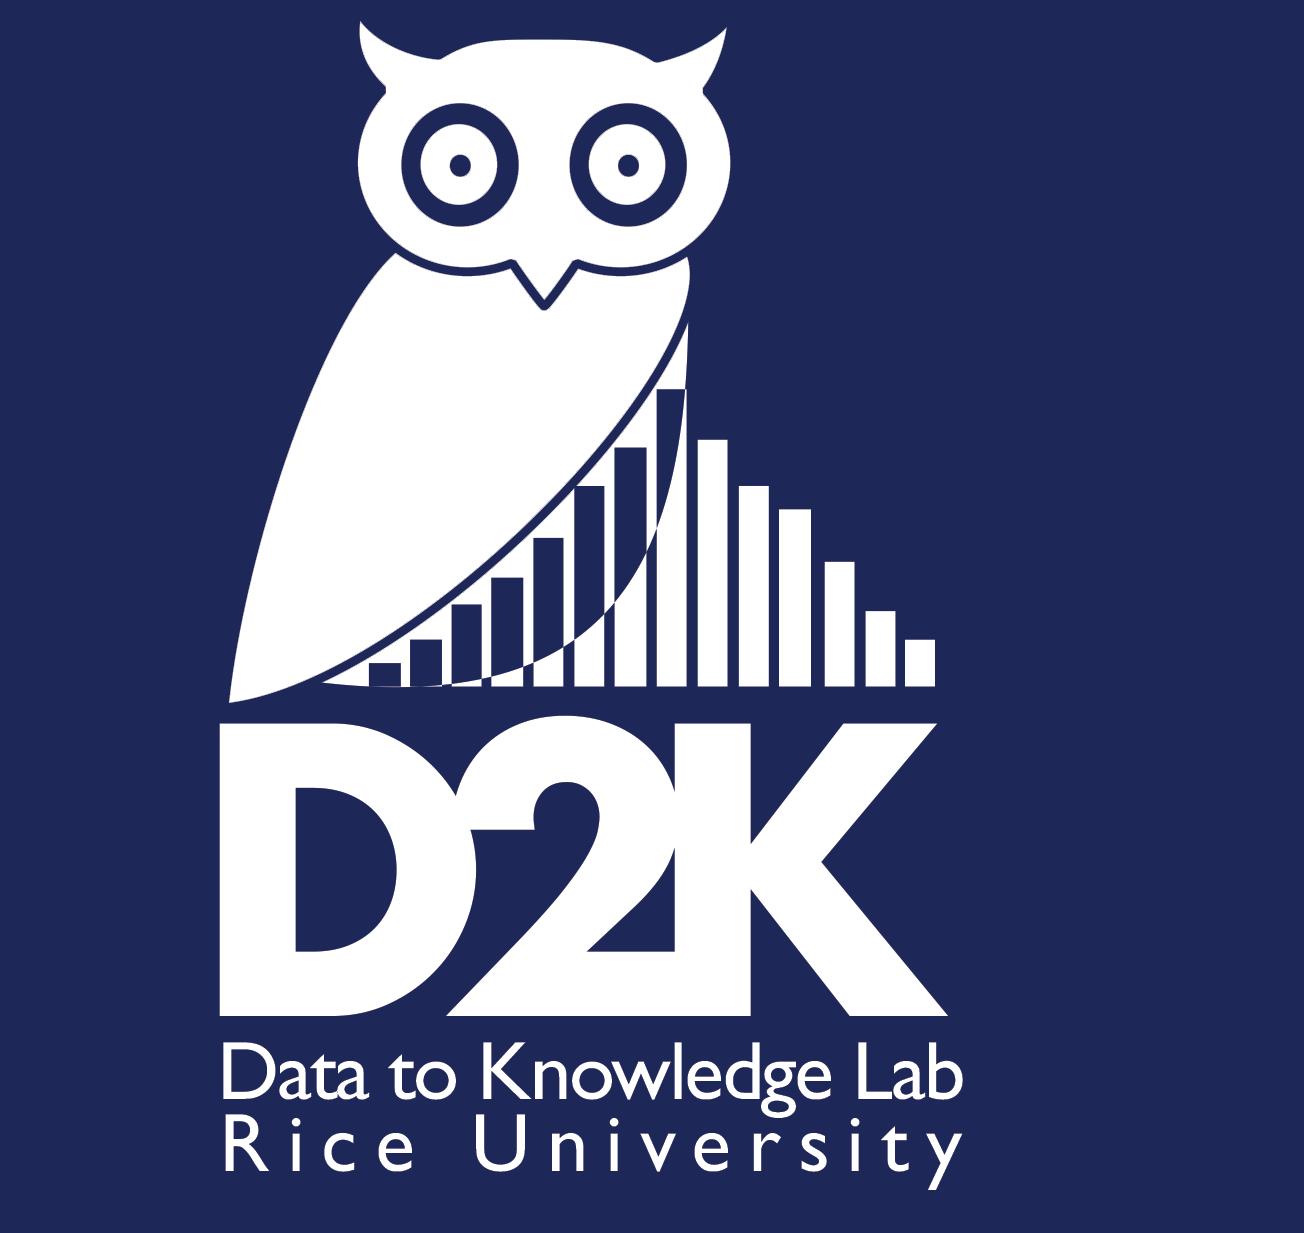 Rice D2K Lab